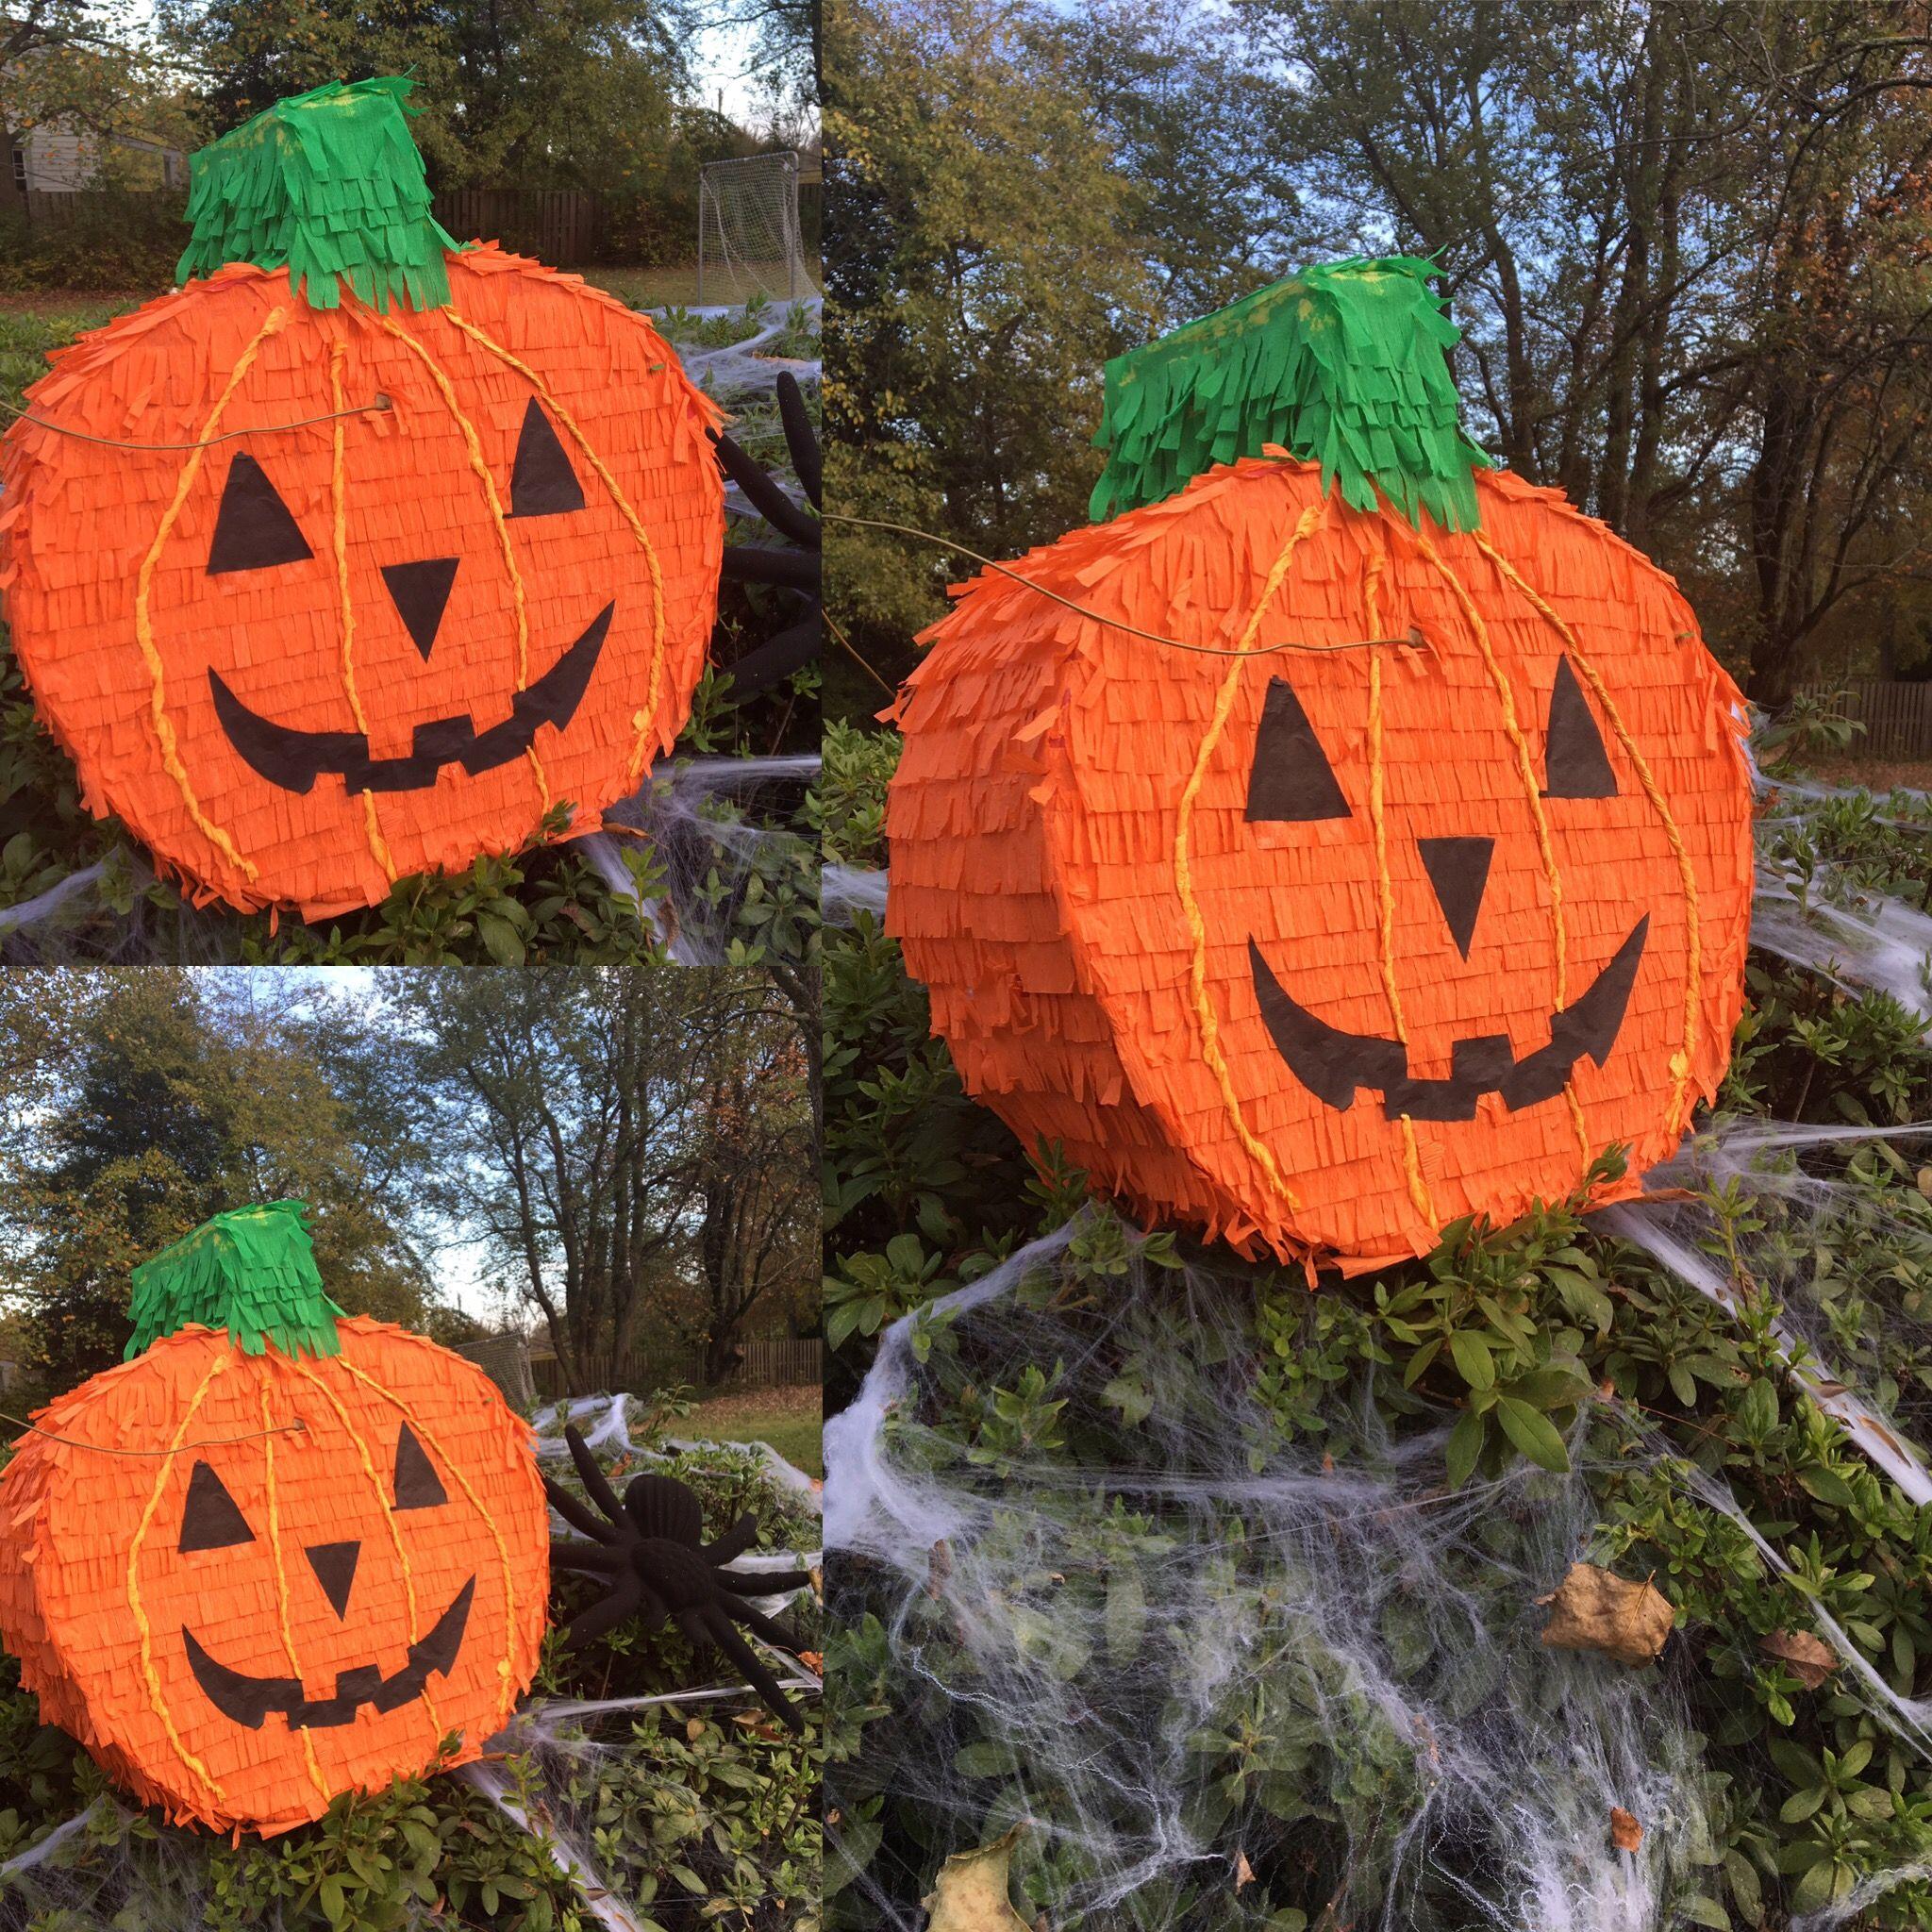 Piñata Halloween Calabaza Decoracion Calabazas Halloween Calabazas De Halloween Moldes Halloween